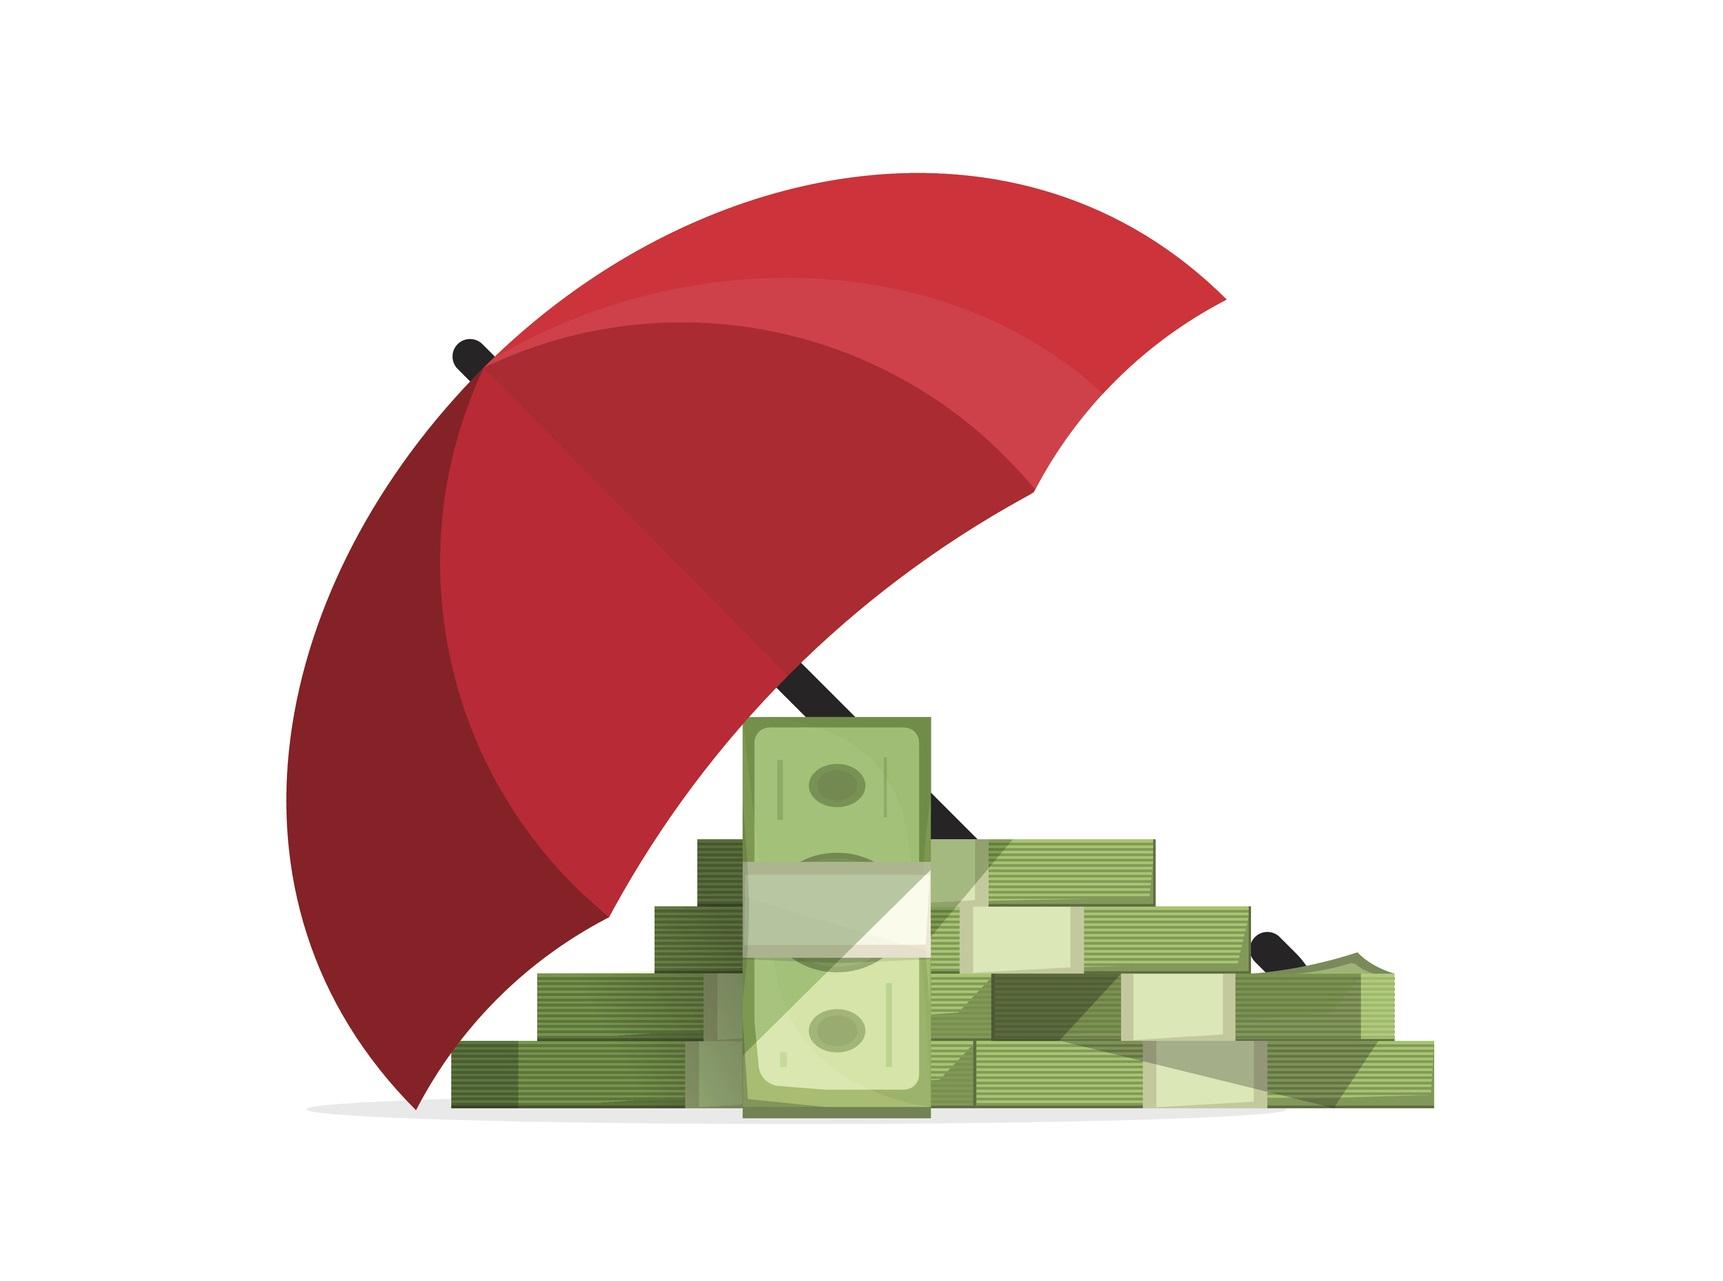 Umbrella over money